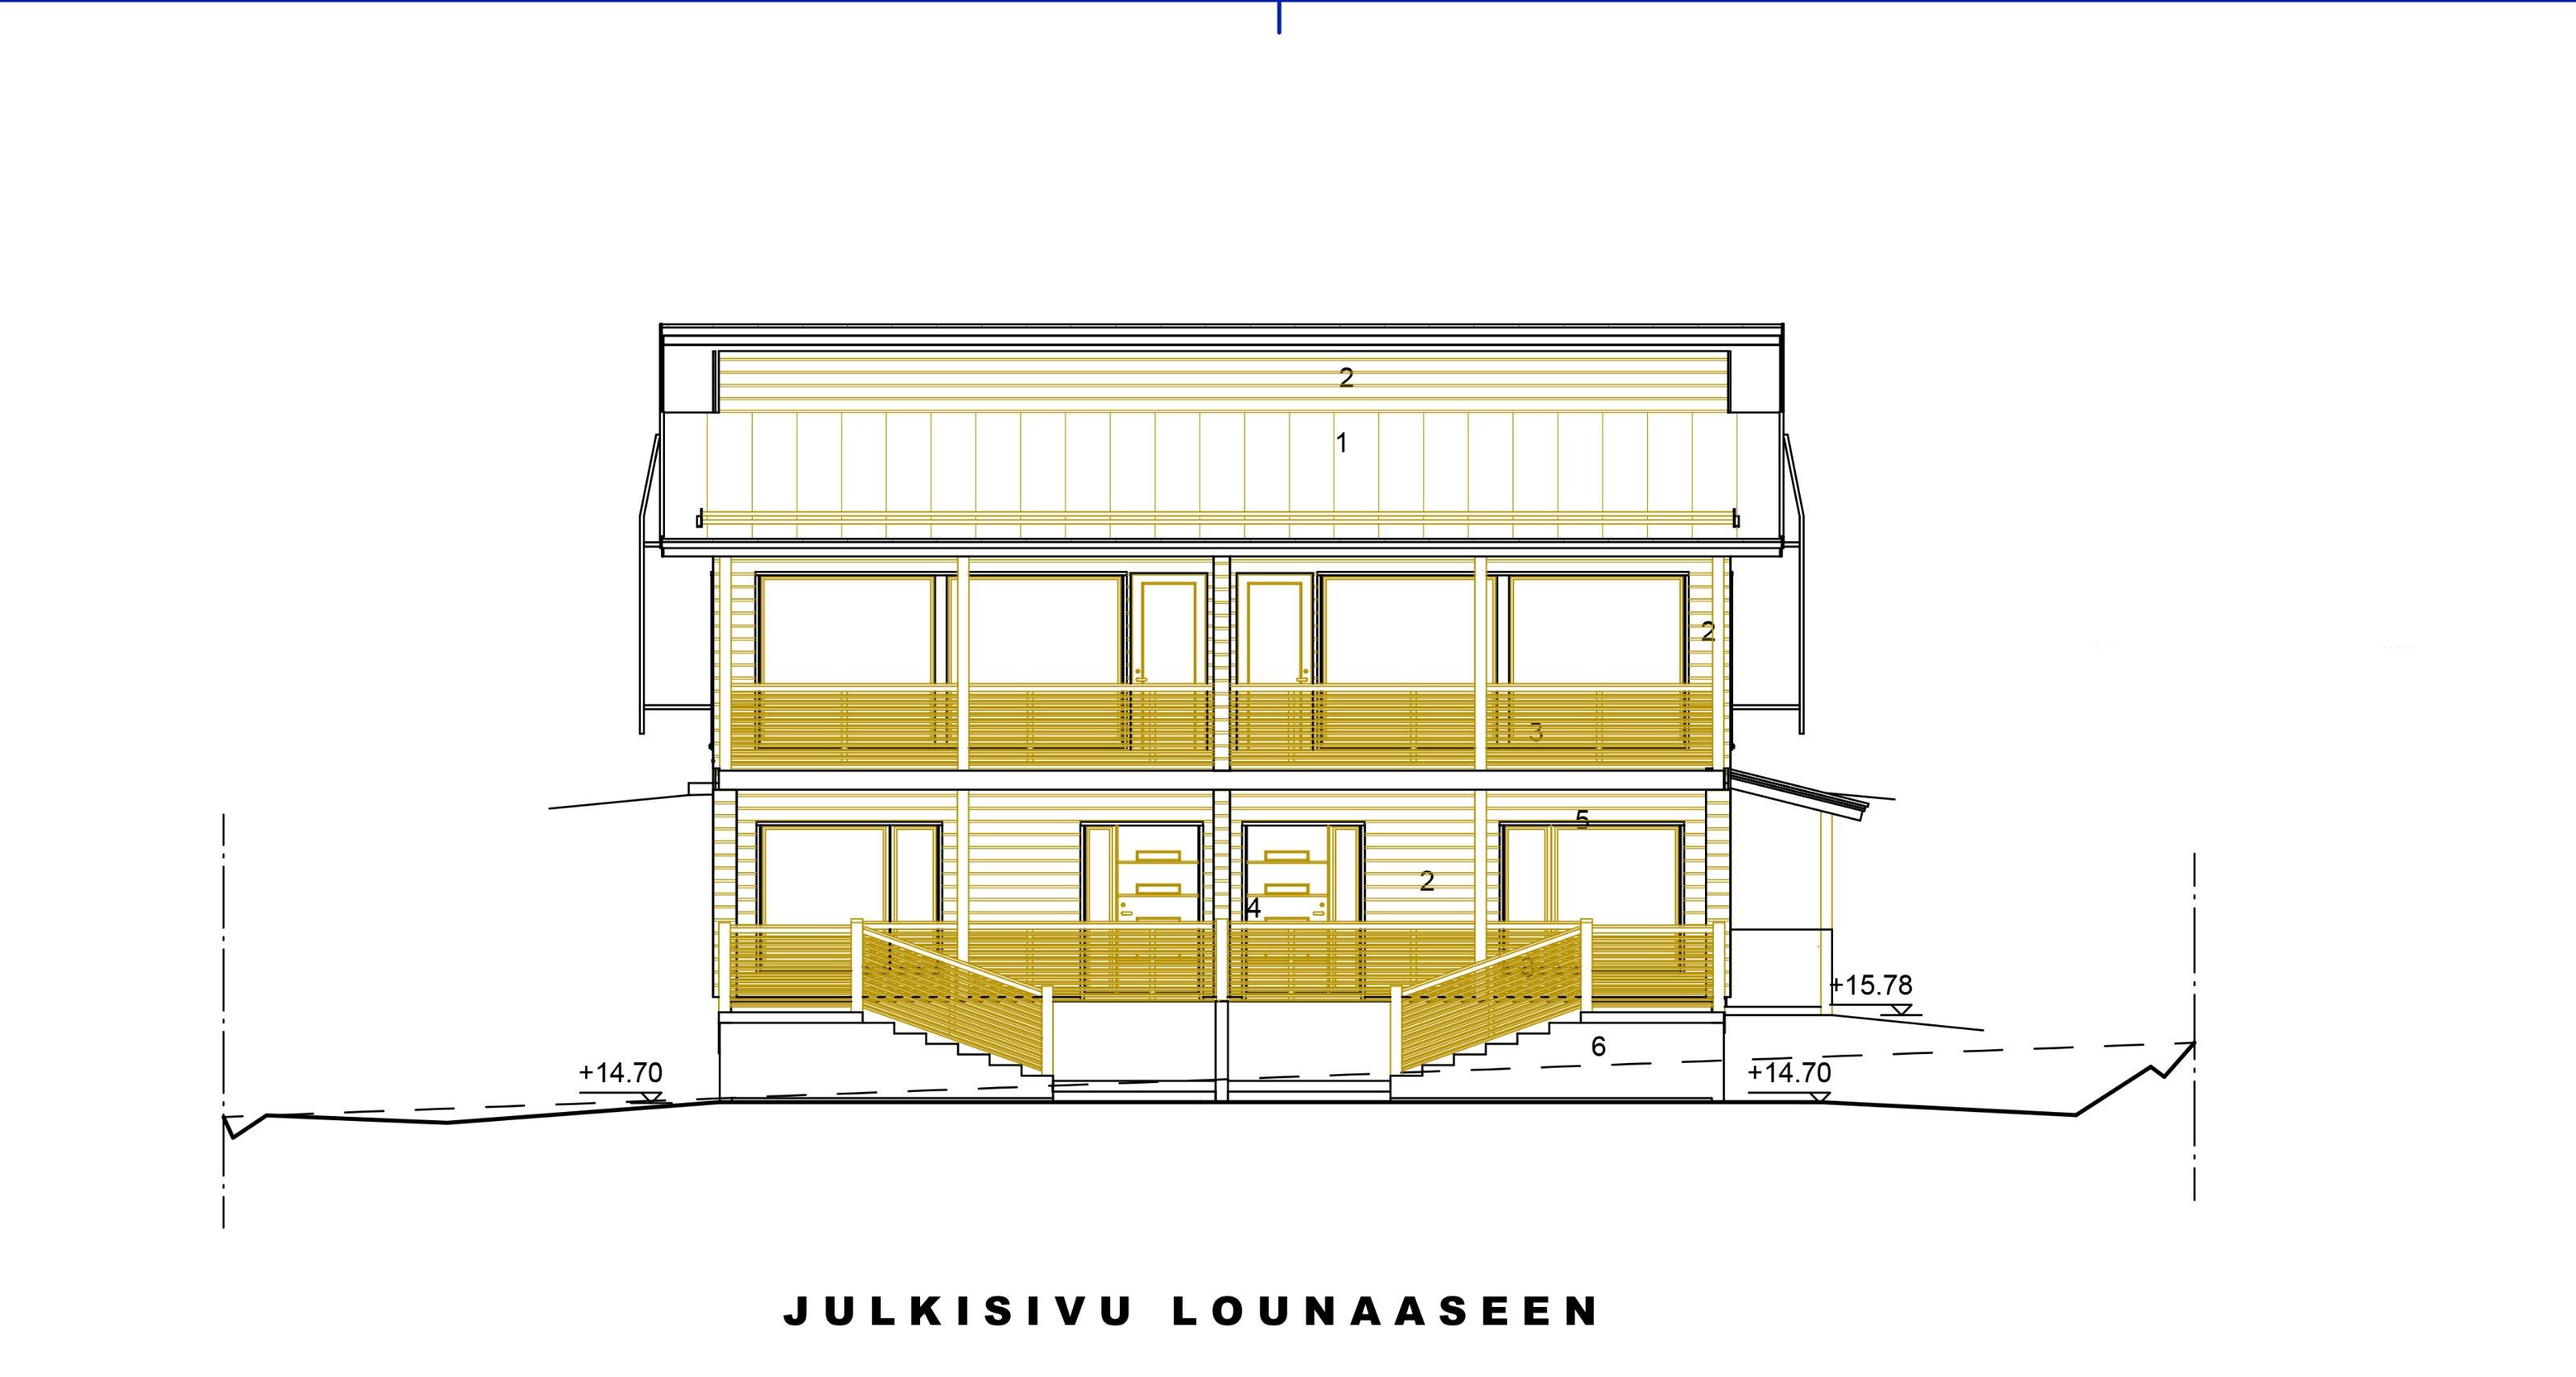 Porvoo, Tolkkinen, Påvalsinkaari 6 B B